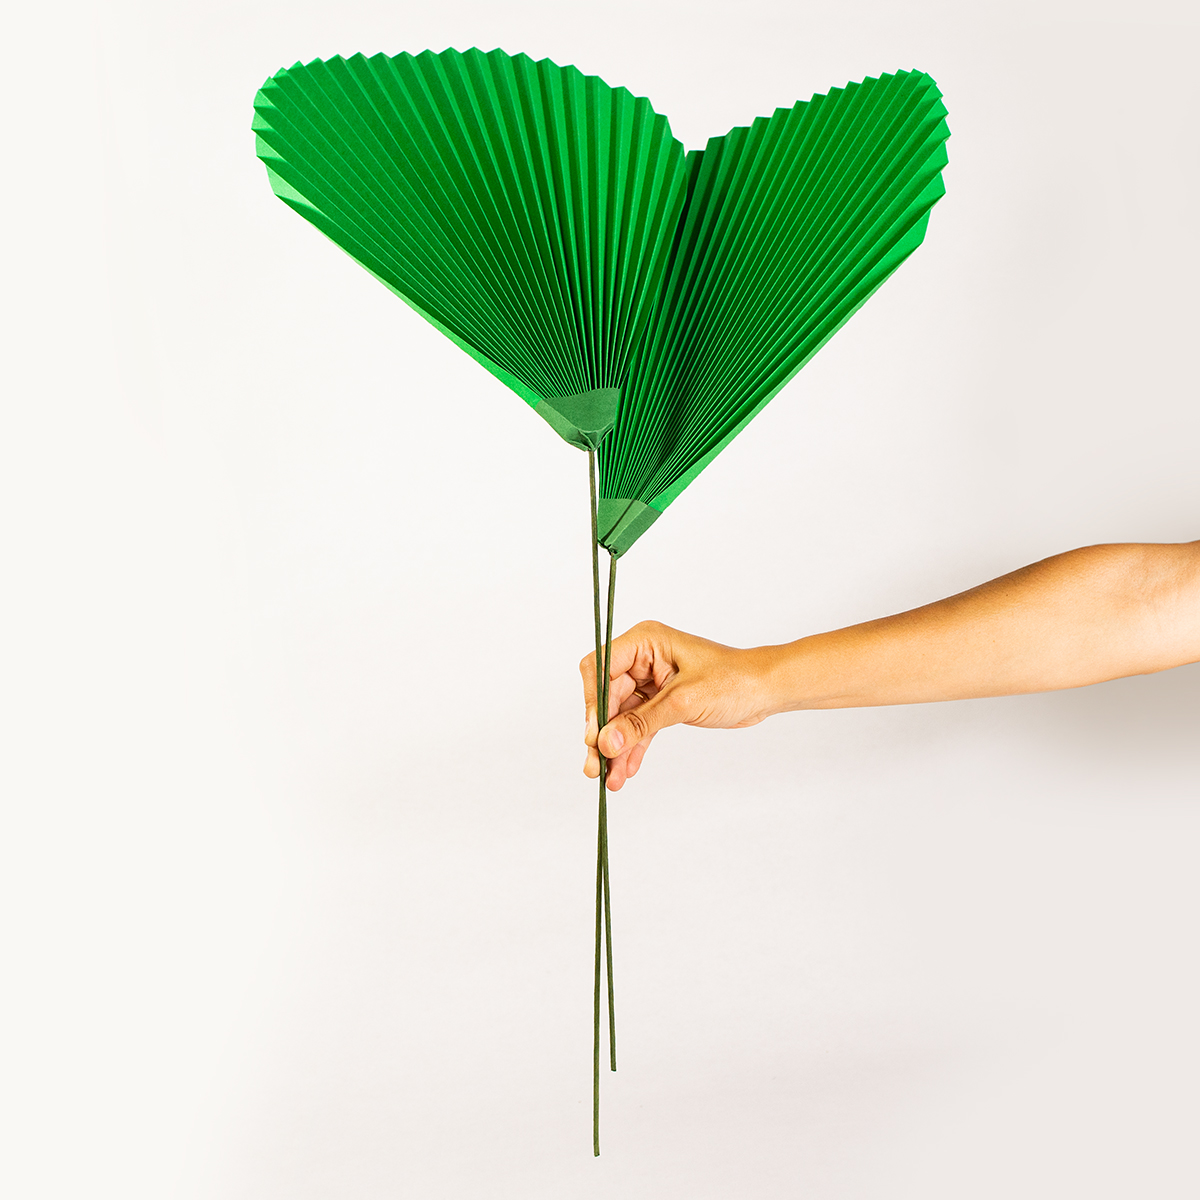 jungla, plantas de papel hojas de palma